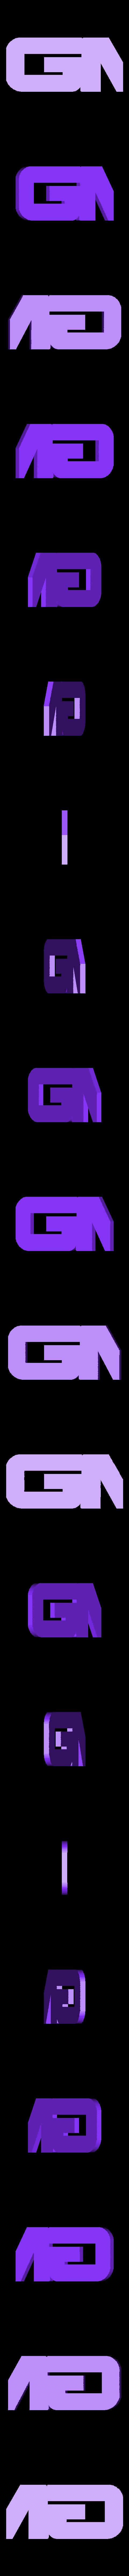 GM.stl Download free STL file GMC logo • 3D print model, MakeItWork